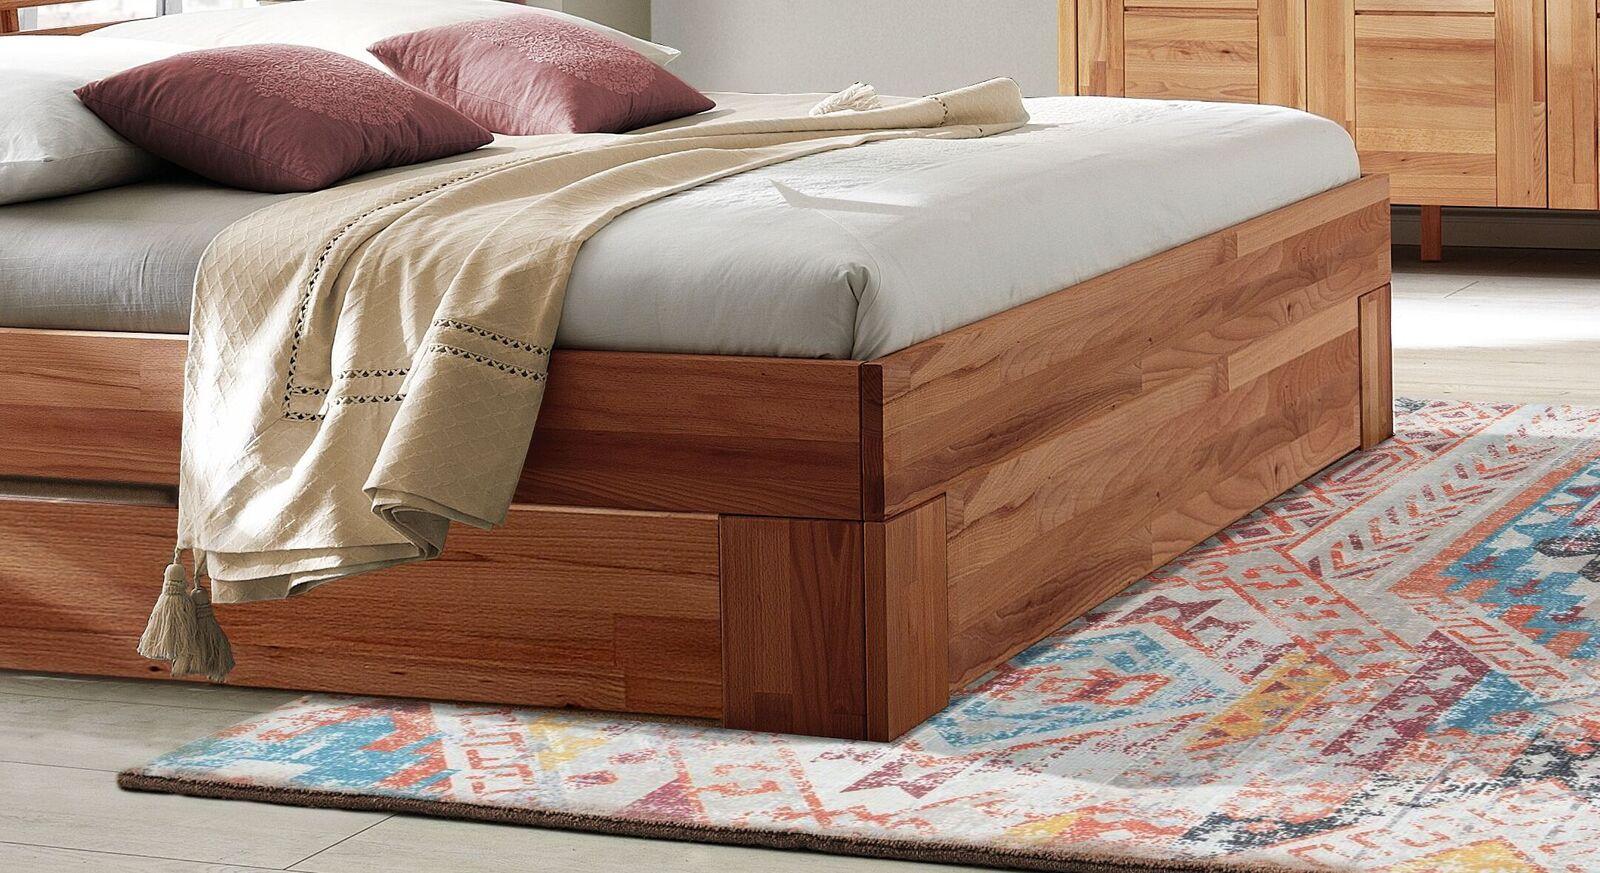 Schubkasten-Bett Halvar inklusive Bettkasten